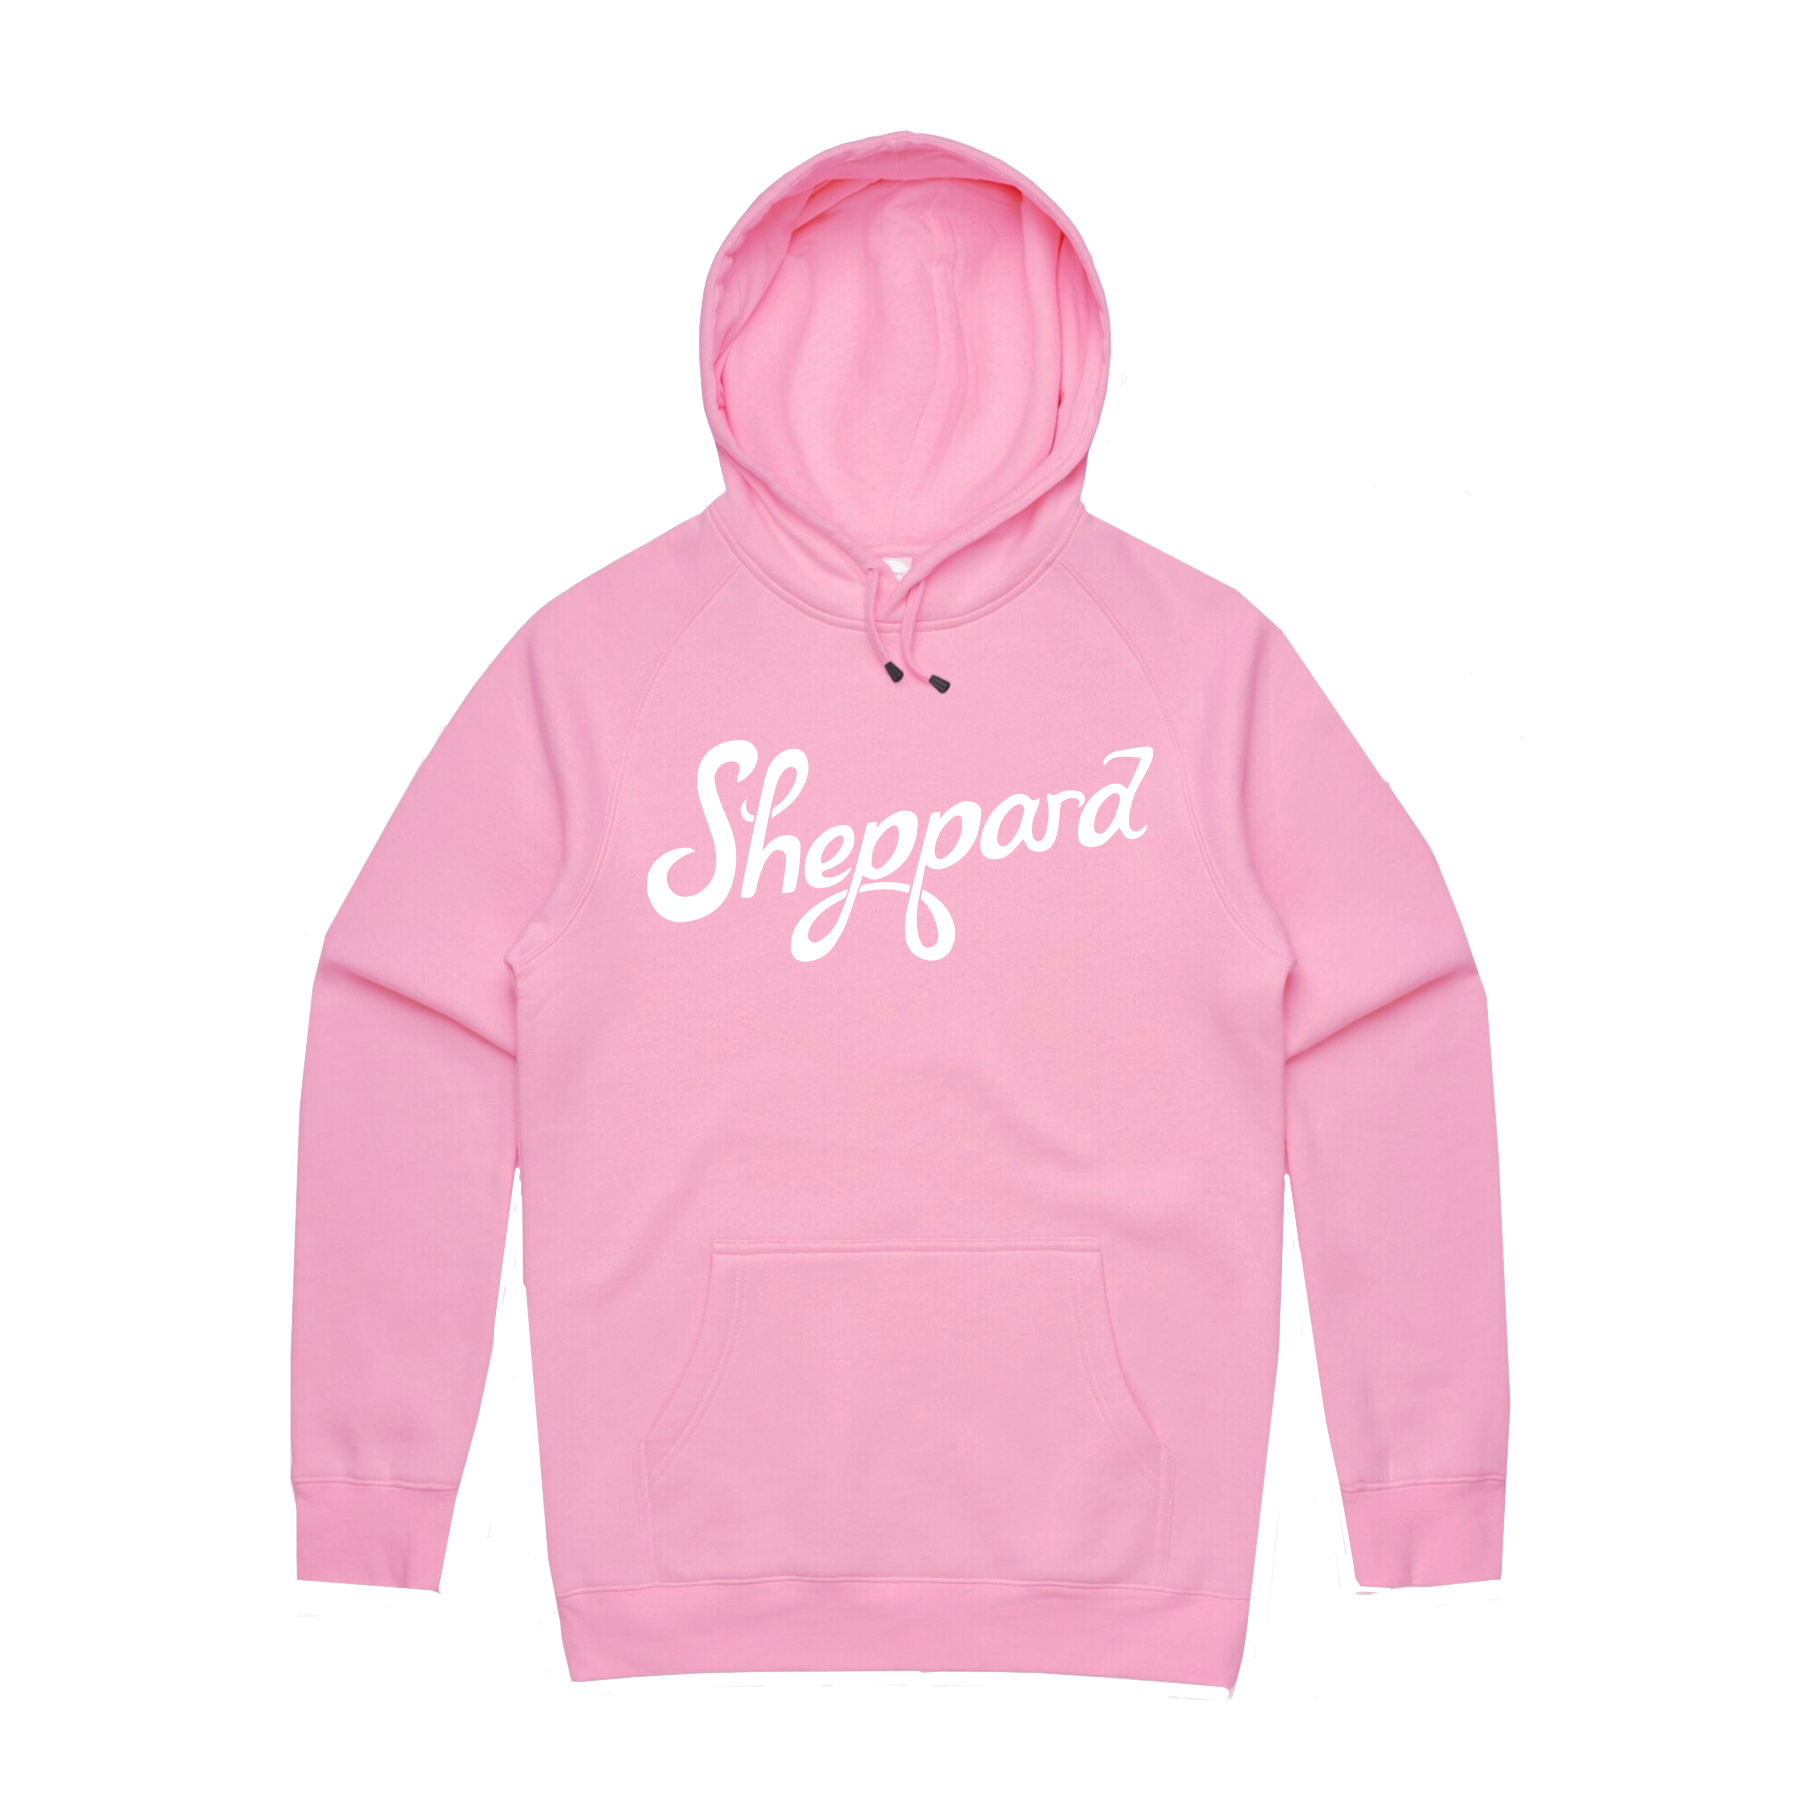 Sheppard - Pink Logo Hoodie